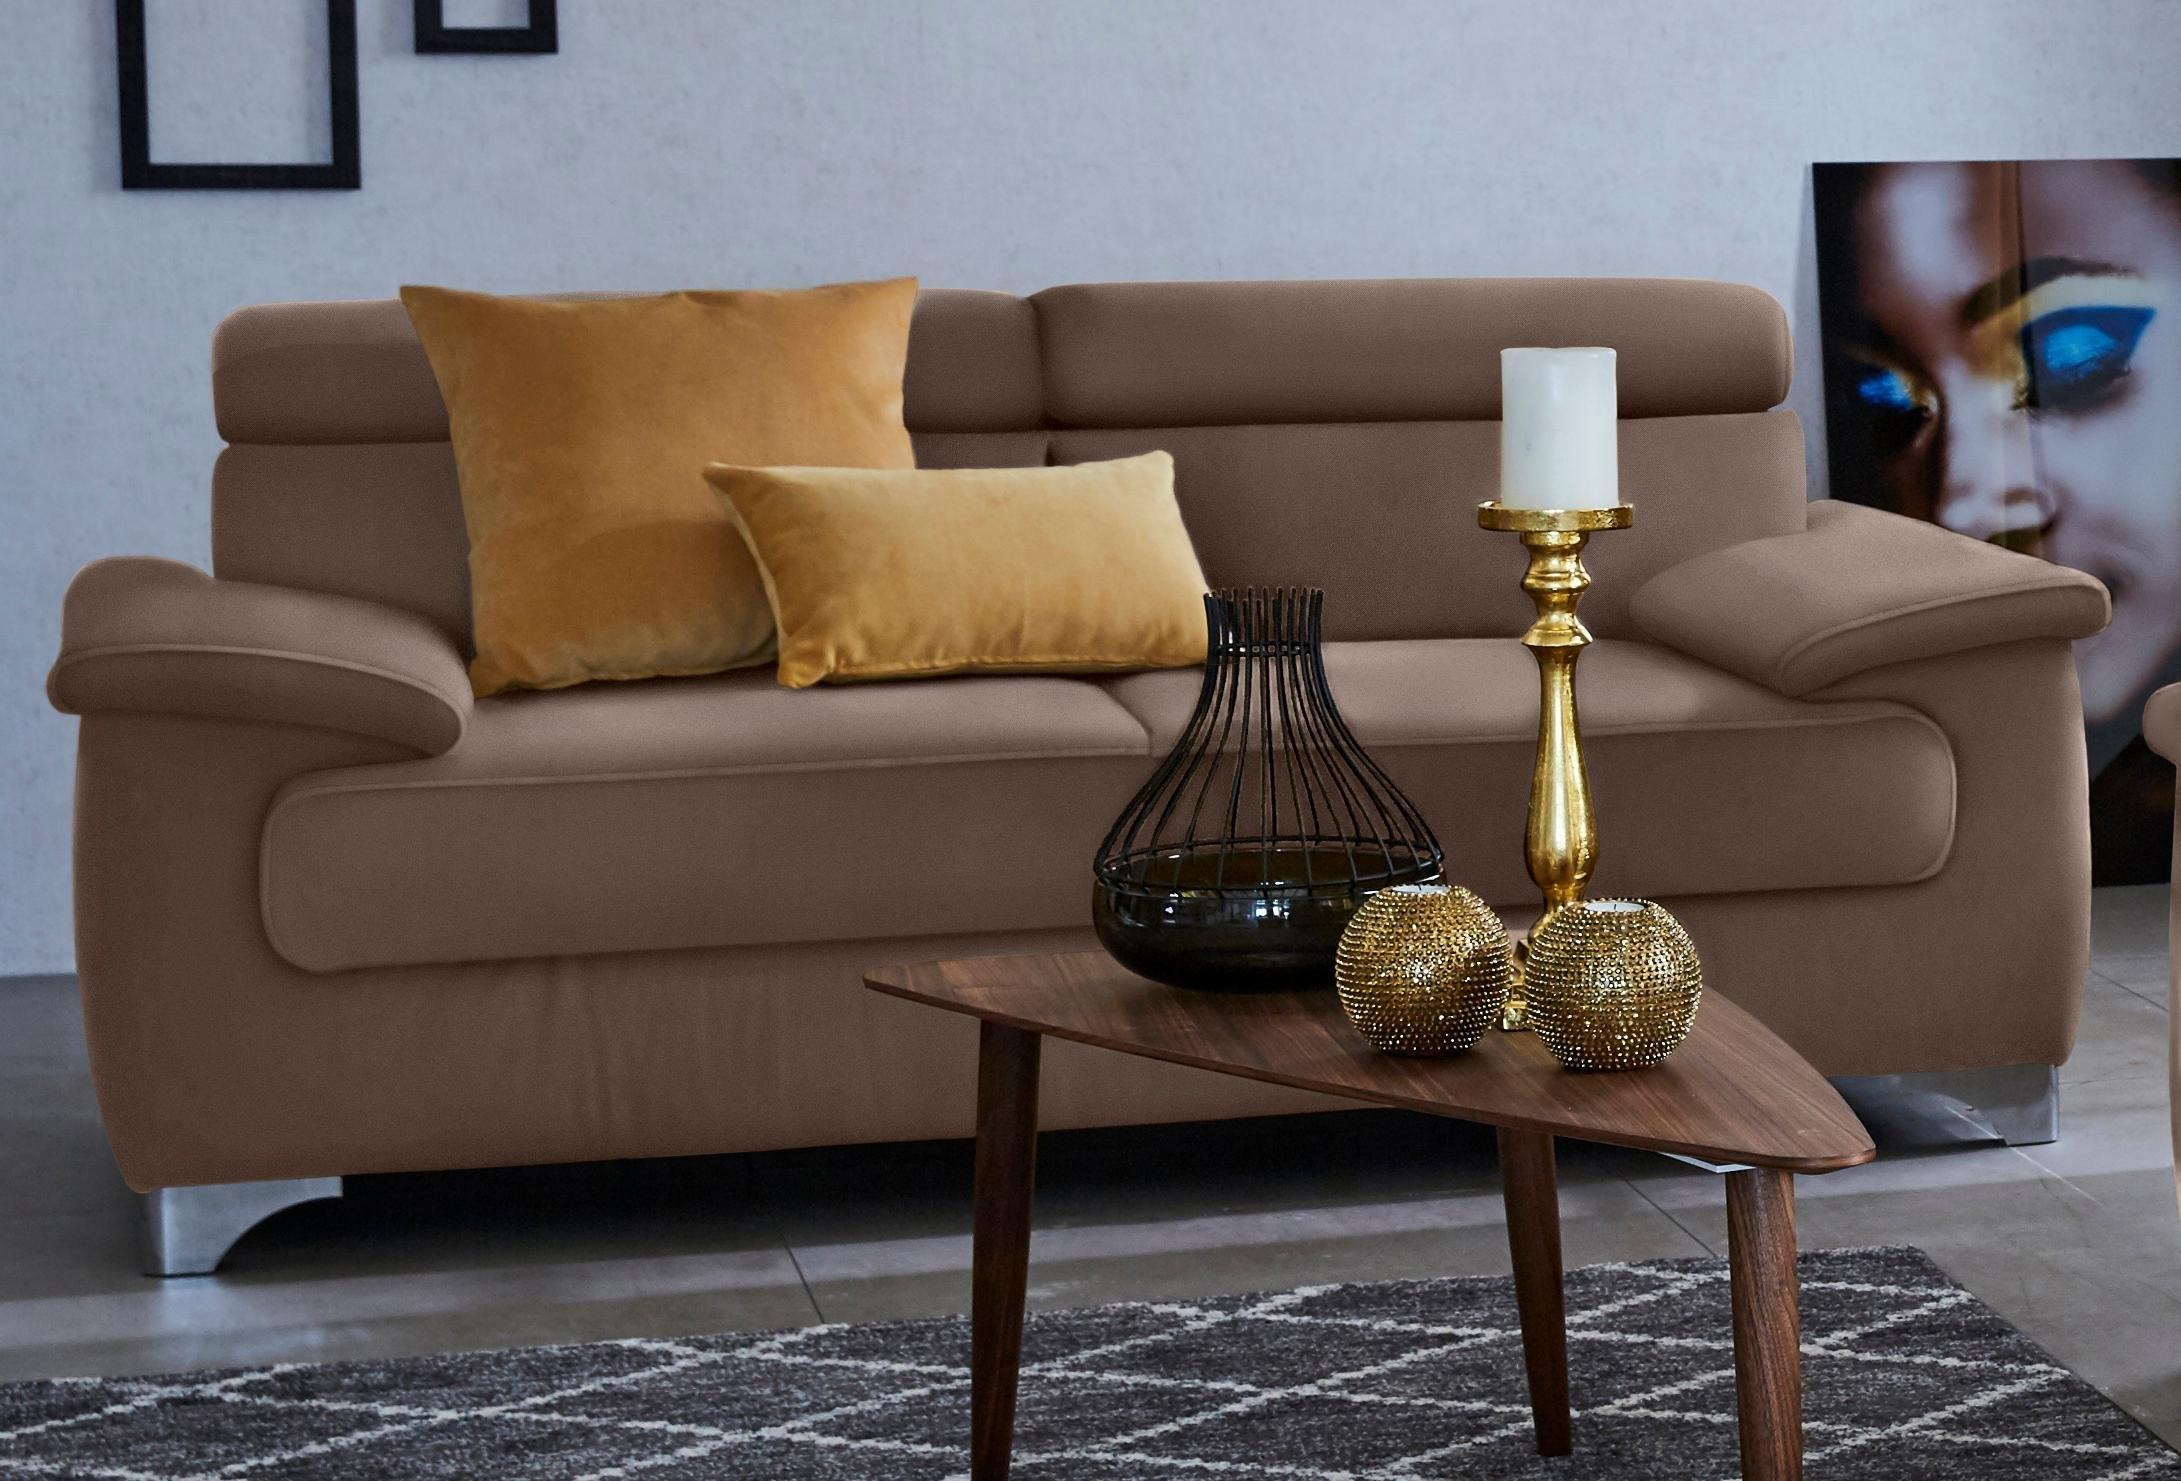 Domo Collection 2-zitsbank, inclusief verstelbare rugleuning nu online bestellen